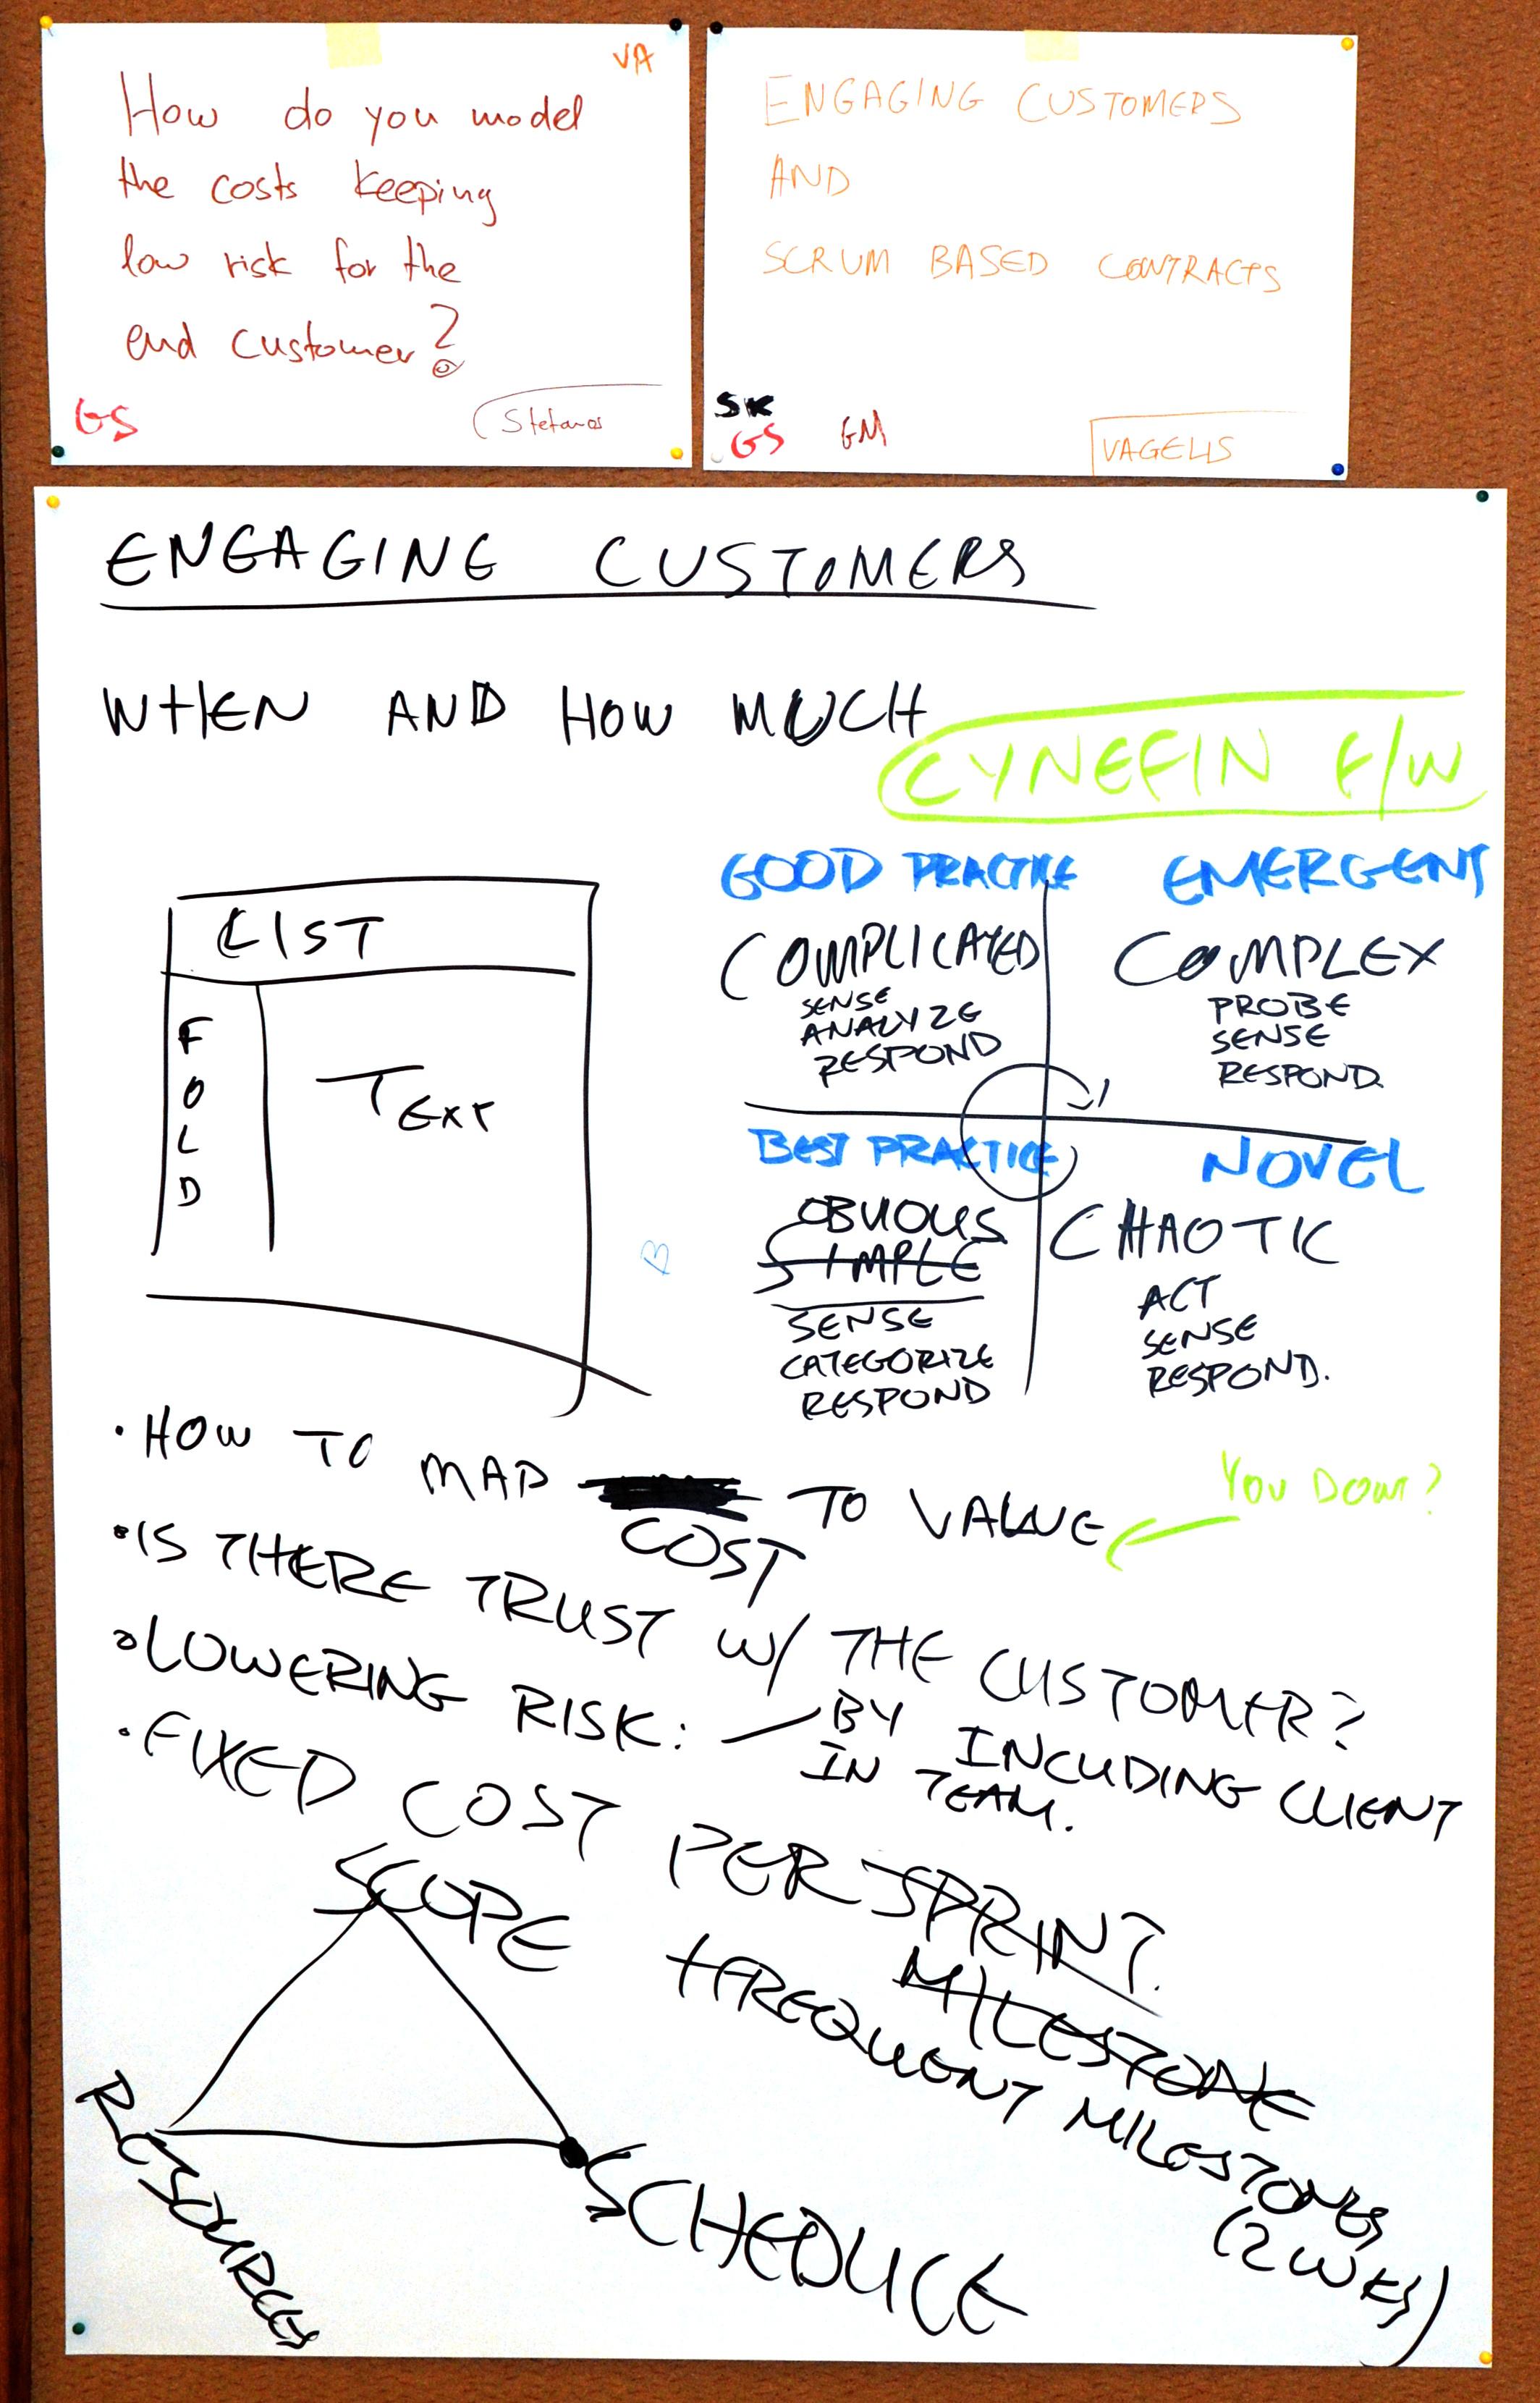 Harvest - Engaging customers